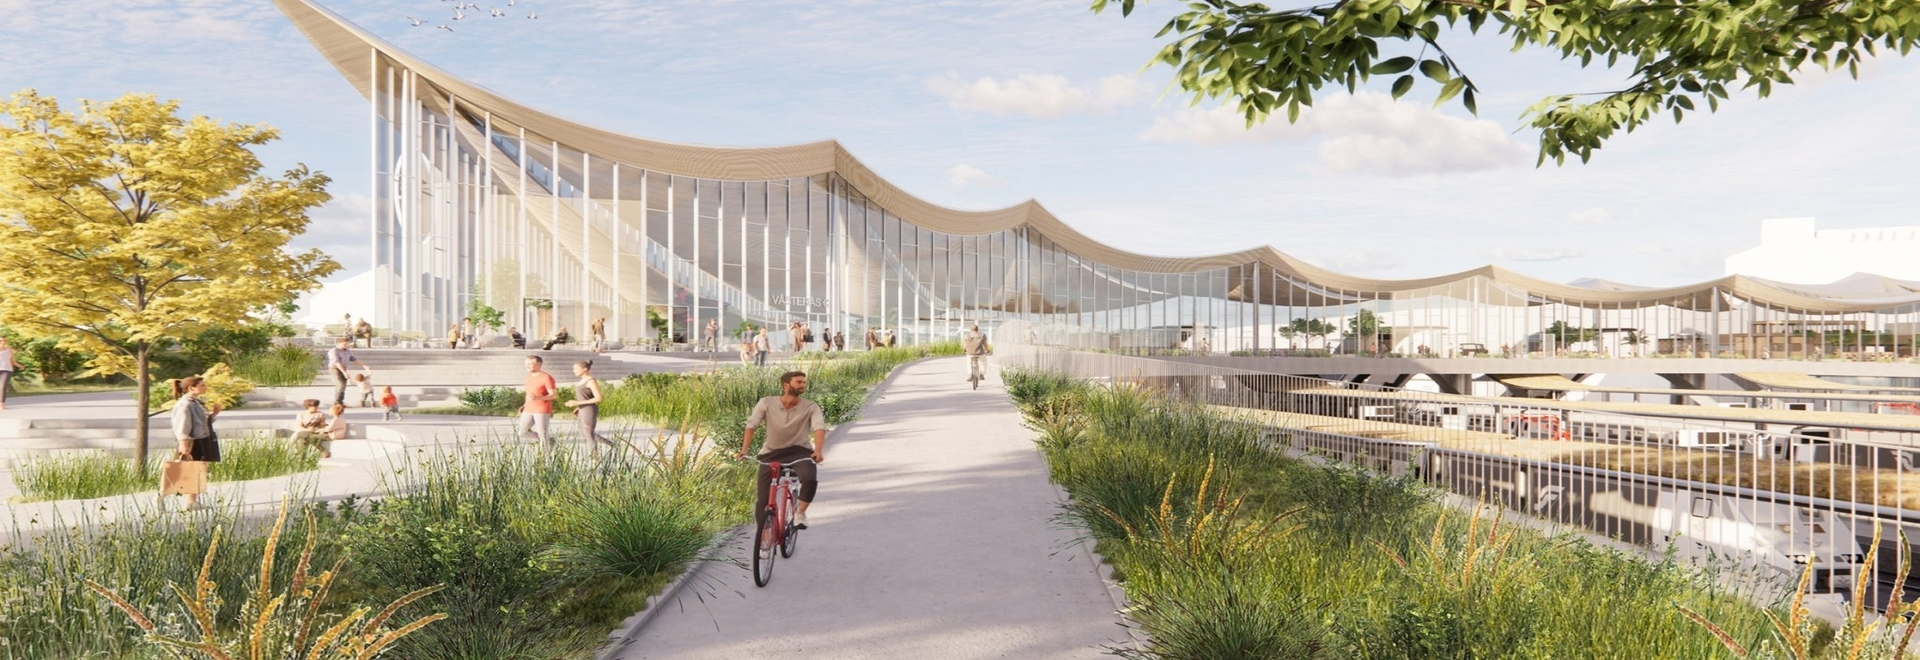 BIG unveils design for Västerås Travel Center with curved timber ceiling